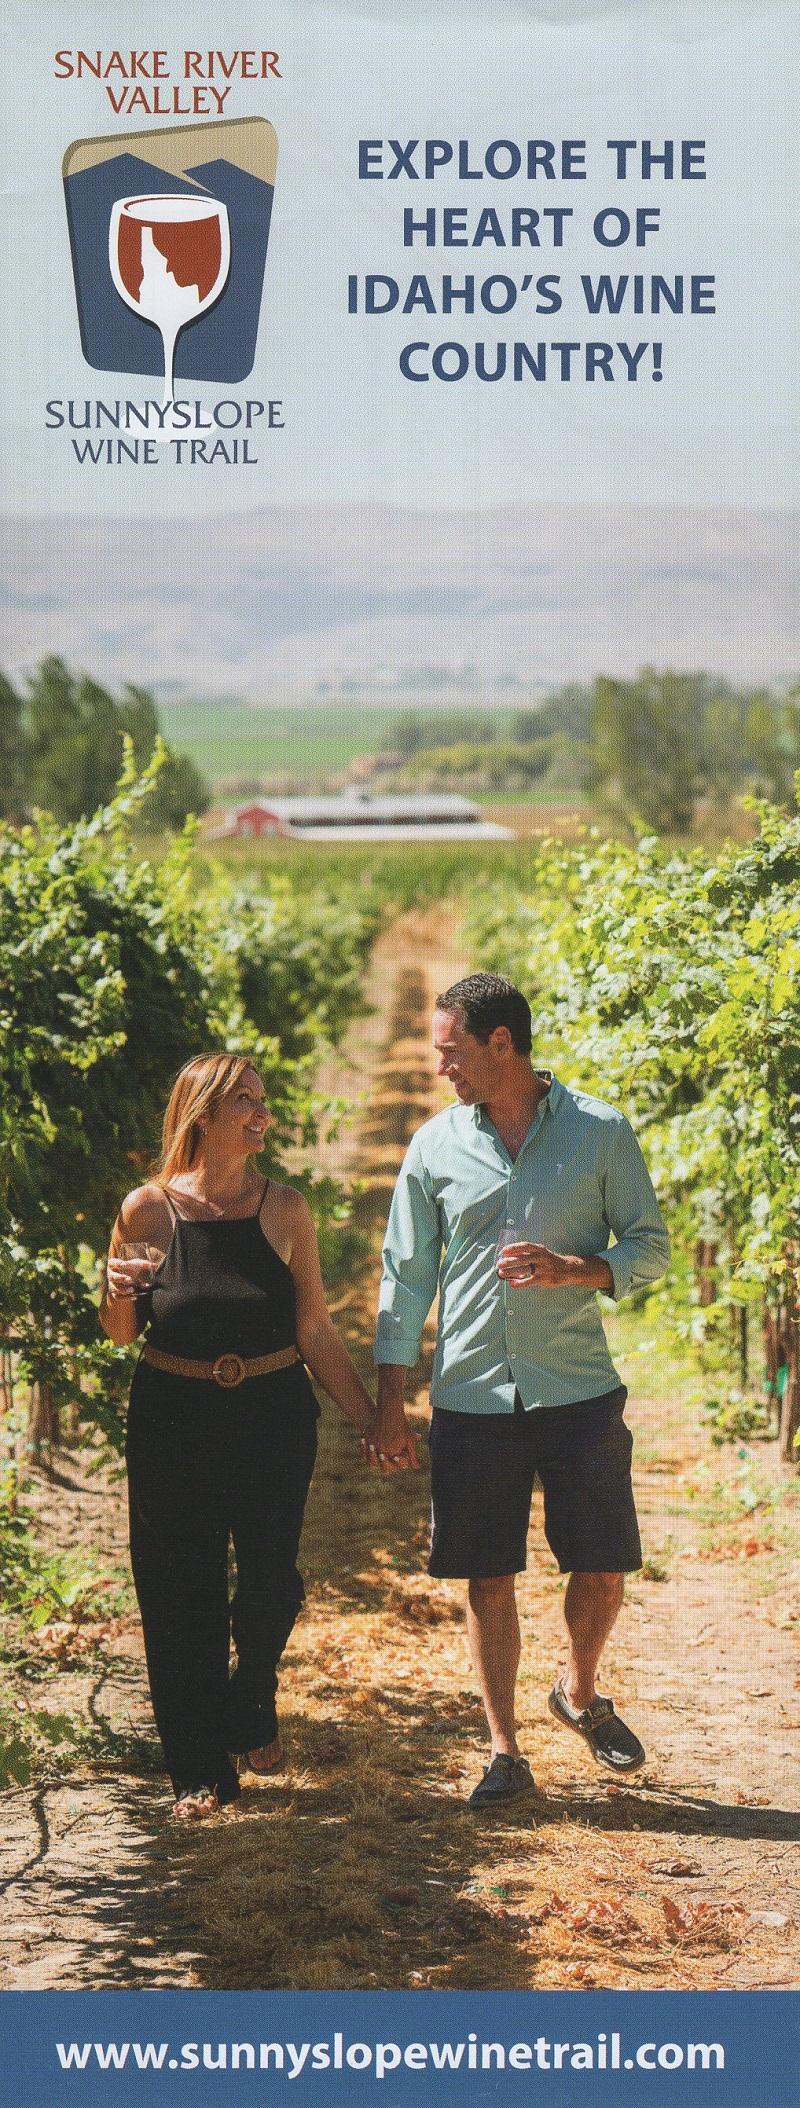 Sunnyslope Wine Trail